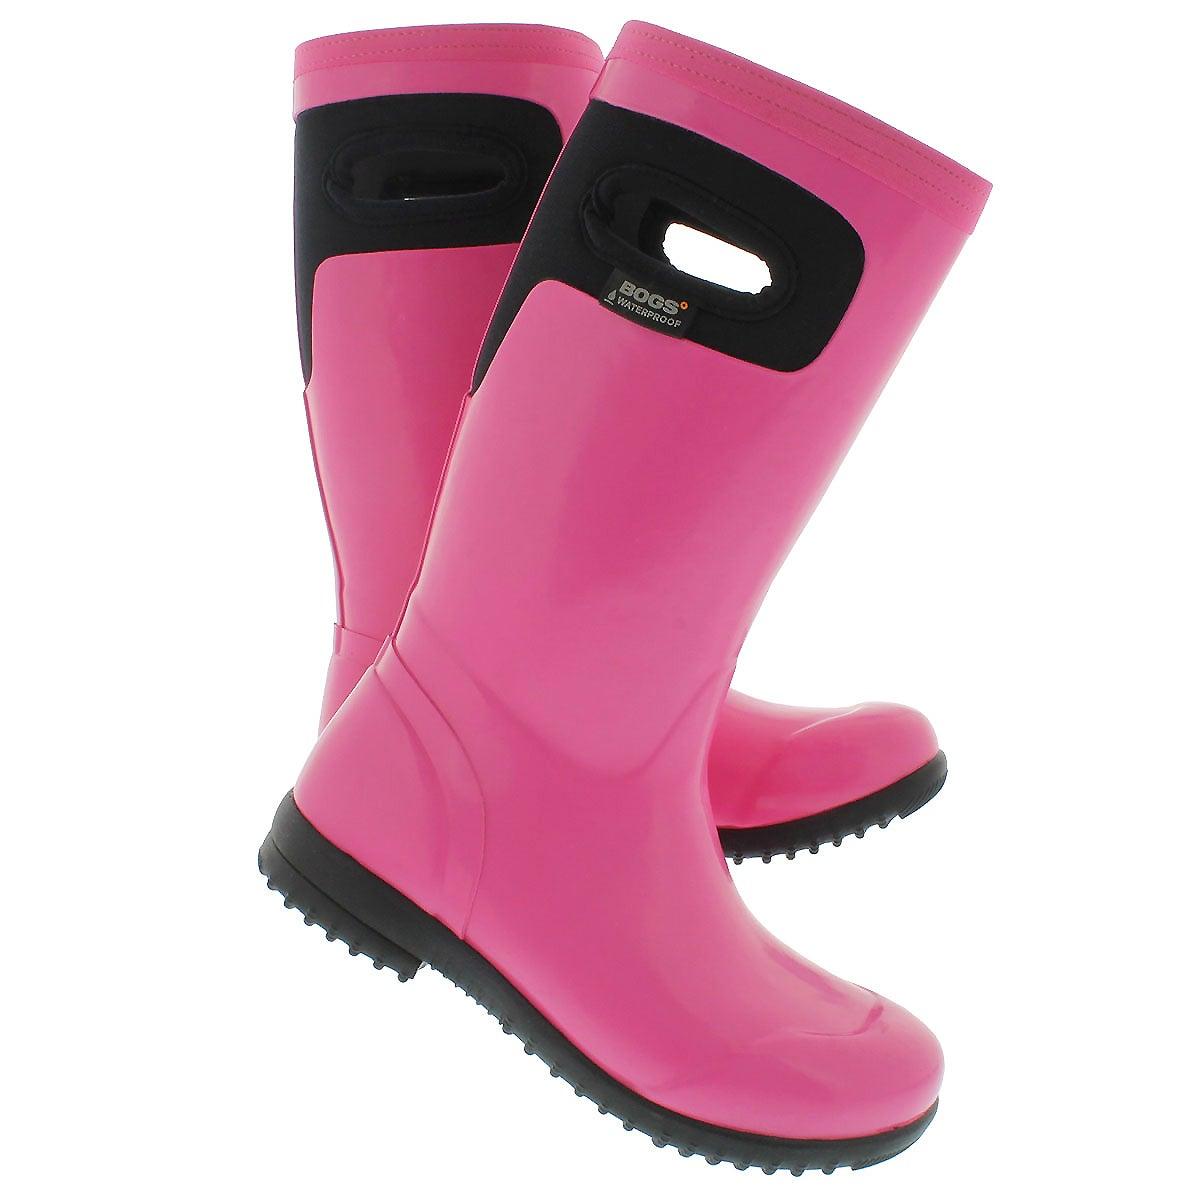 Botte pluie Tacoma Solid, rose, filles